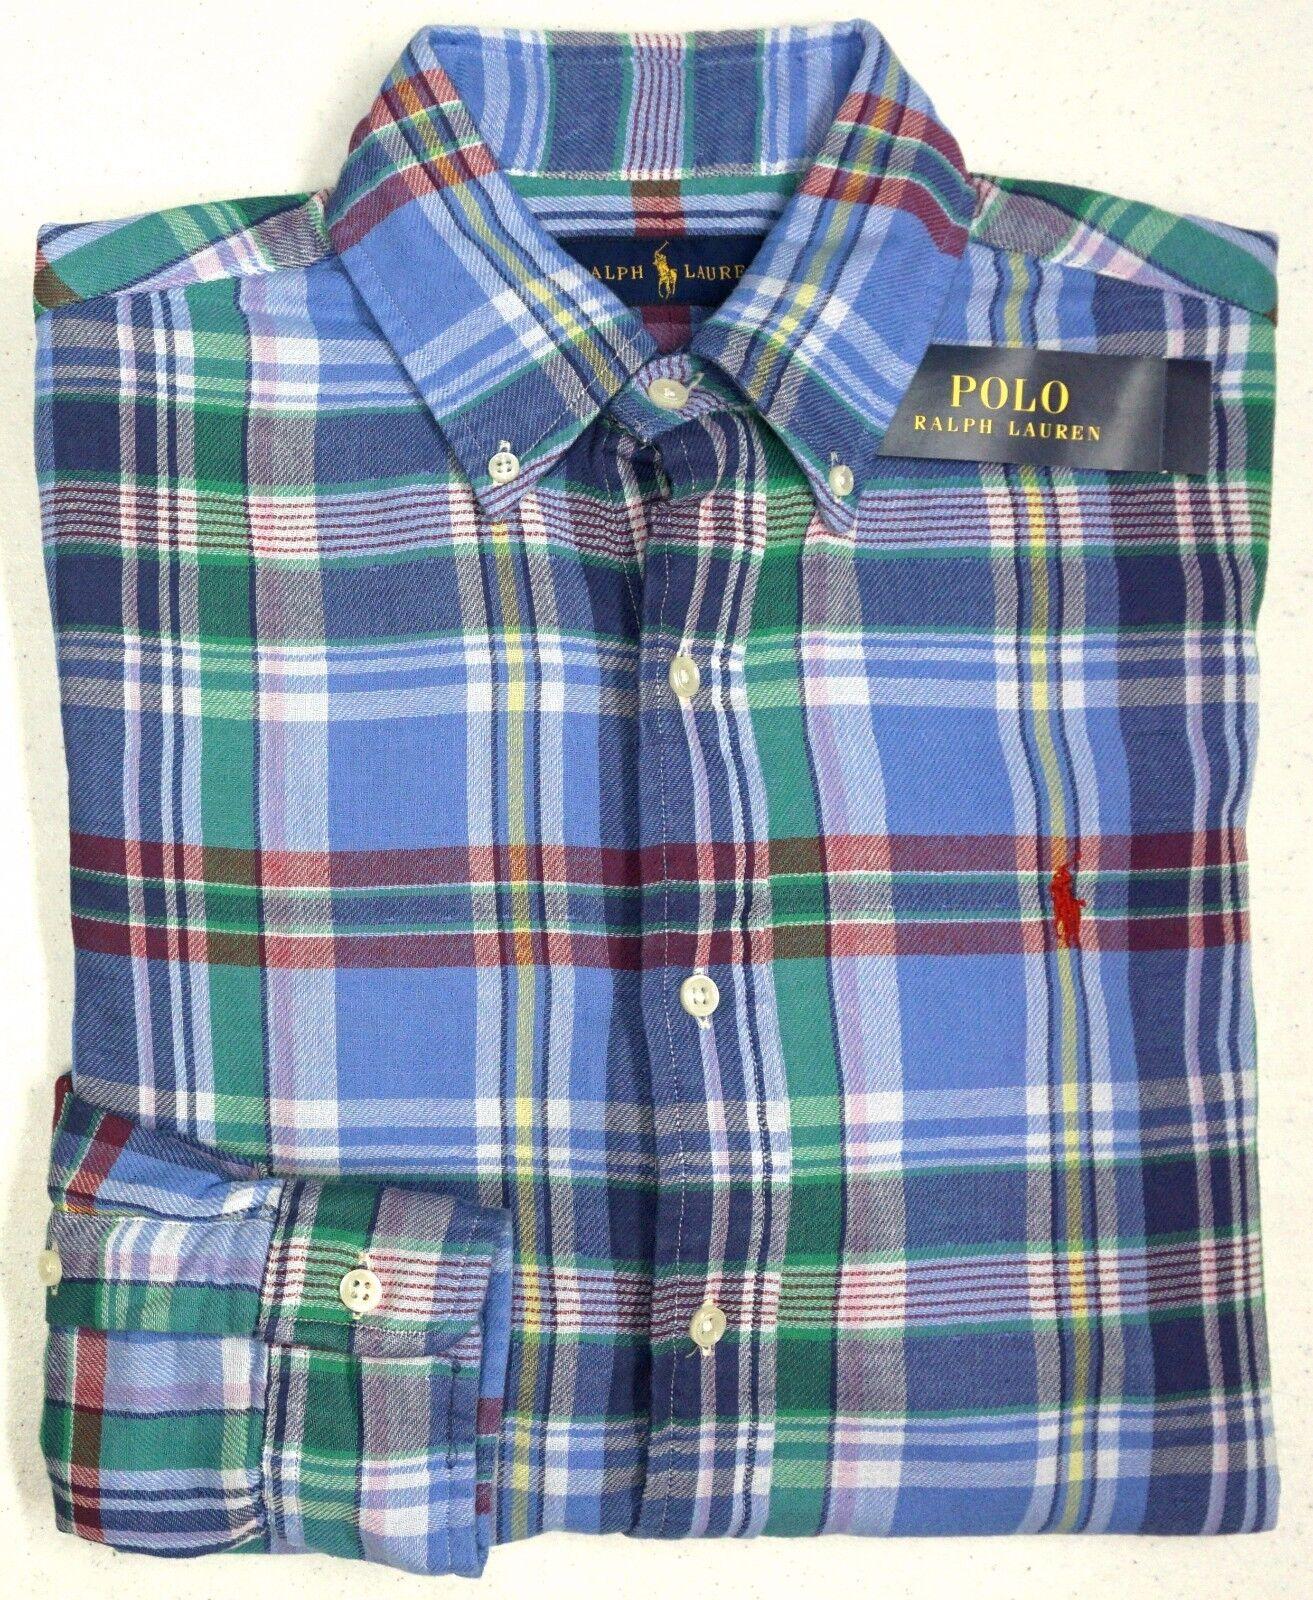 386b604b8 Polo Ralph Lauren LS Mens S L XL bluee Red Plaid Button NEW NWT Shirt  ndtnts1043-Casual Button-Down Shirts